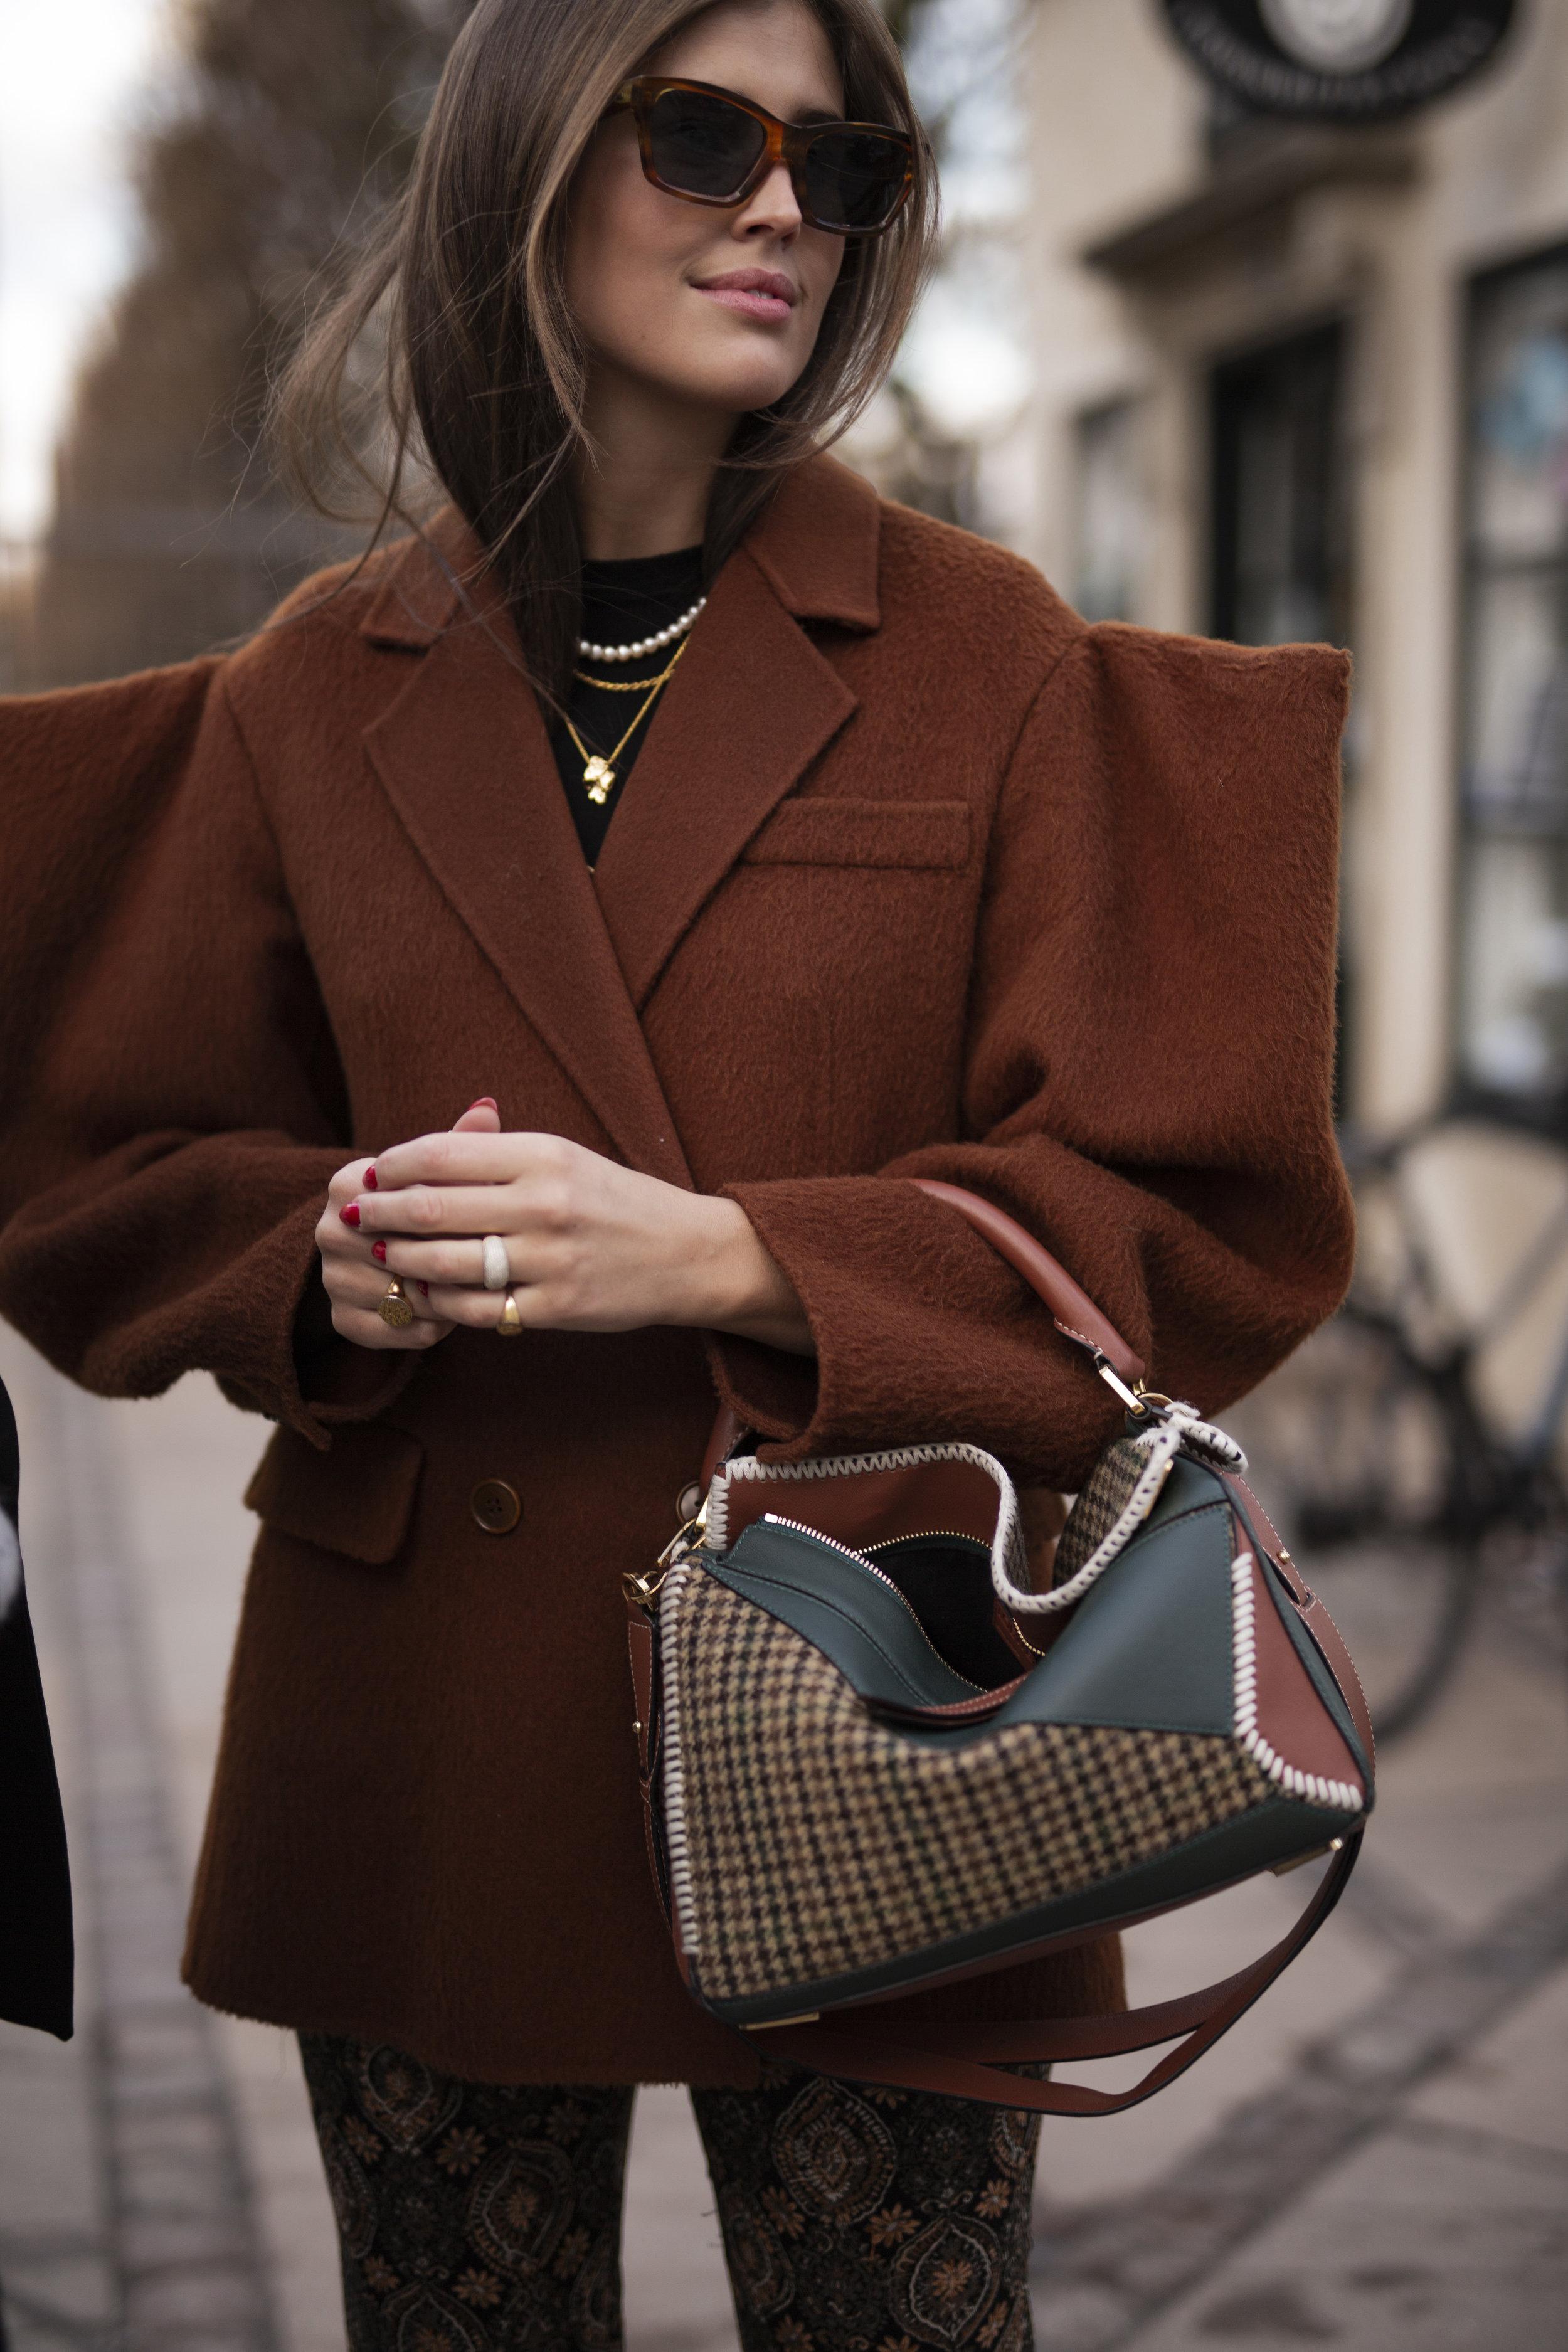 Streetstyle during Copenhagen Fashion Week. Here is beautiful Darja Barannik in a design jacket from Annikiki